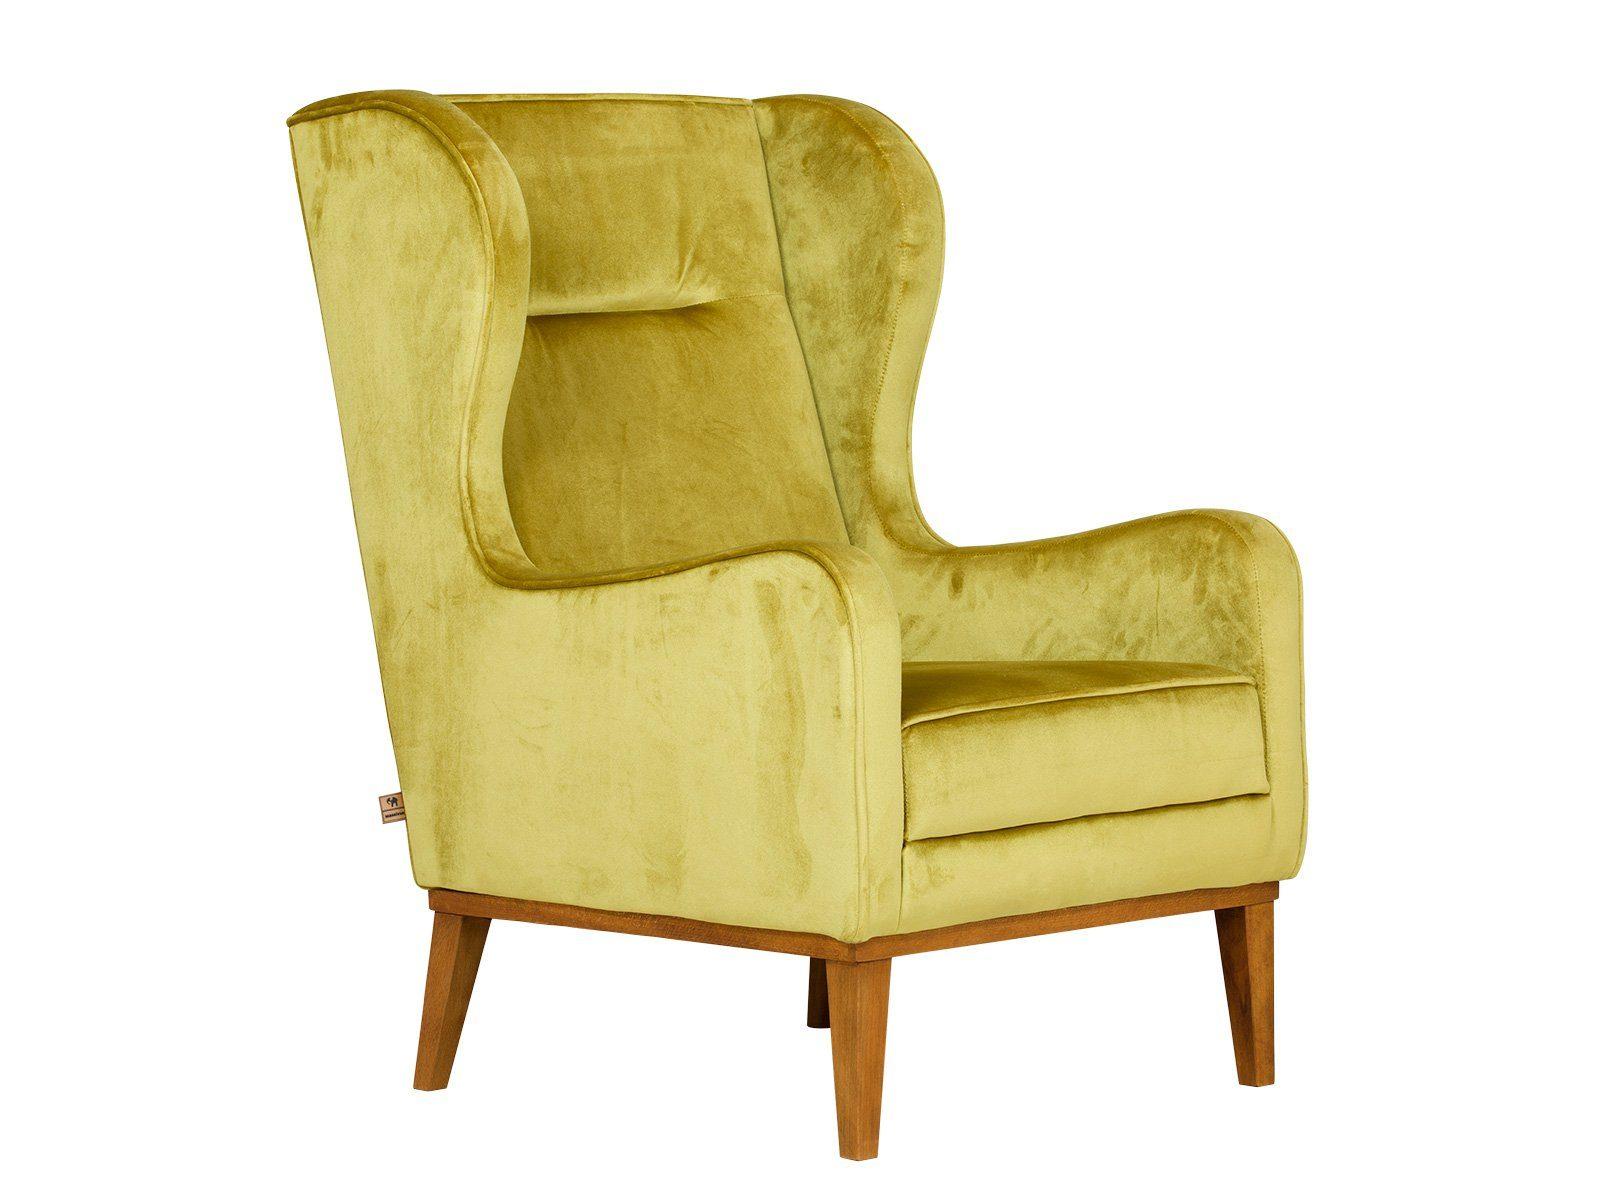 10 sparen sessel asaka nur 377 91 cherry m bel otto. Black Bedroom Furniture Sets. Home Design Ideas